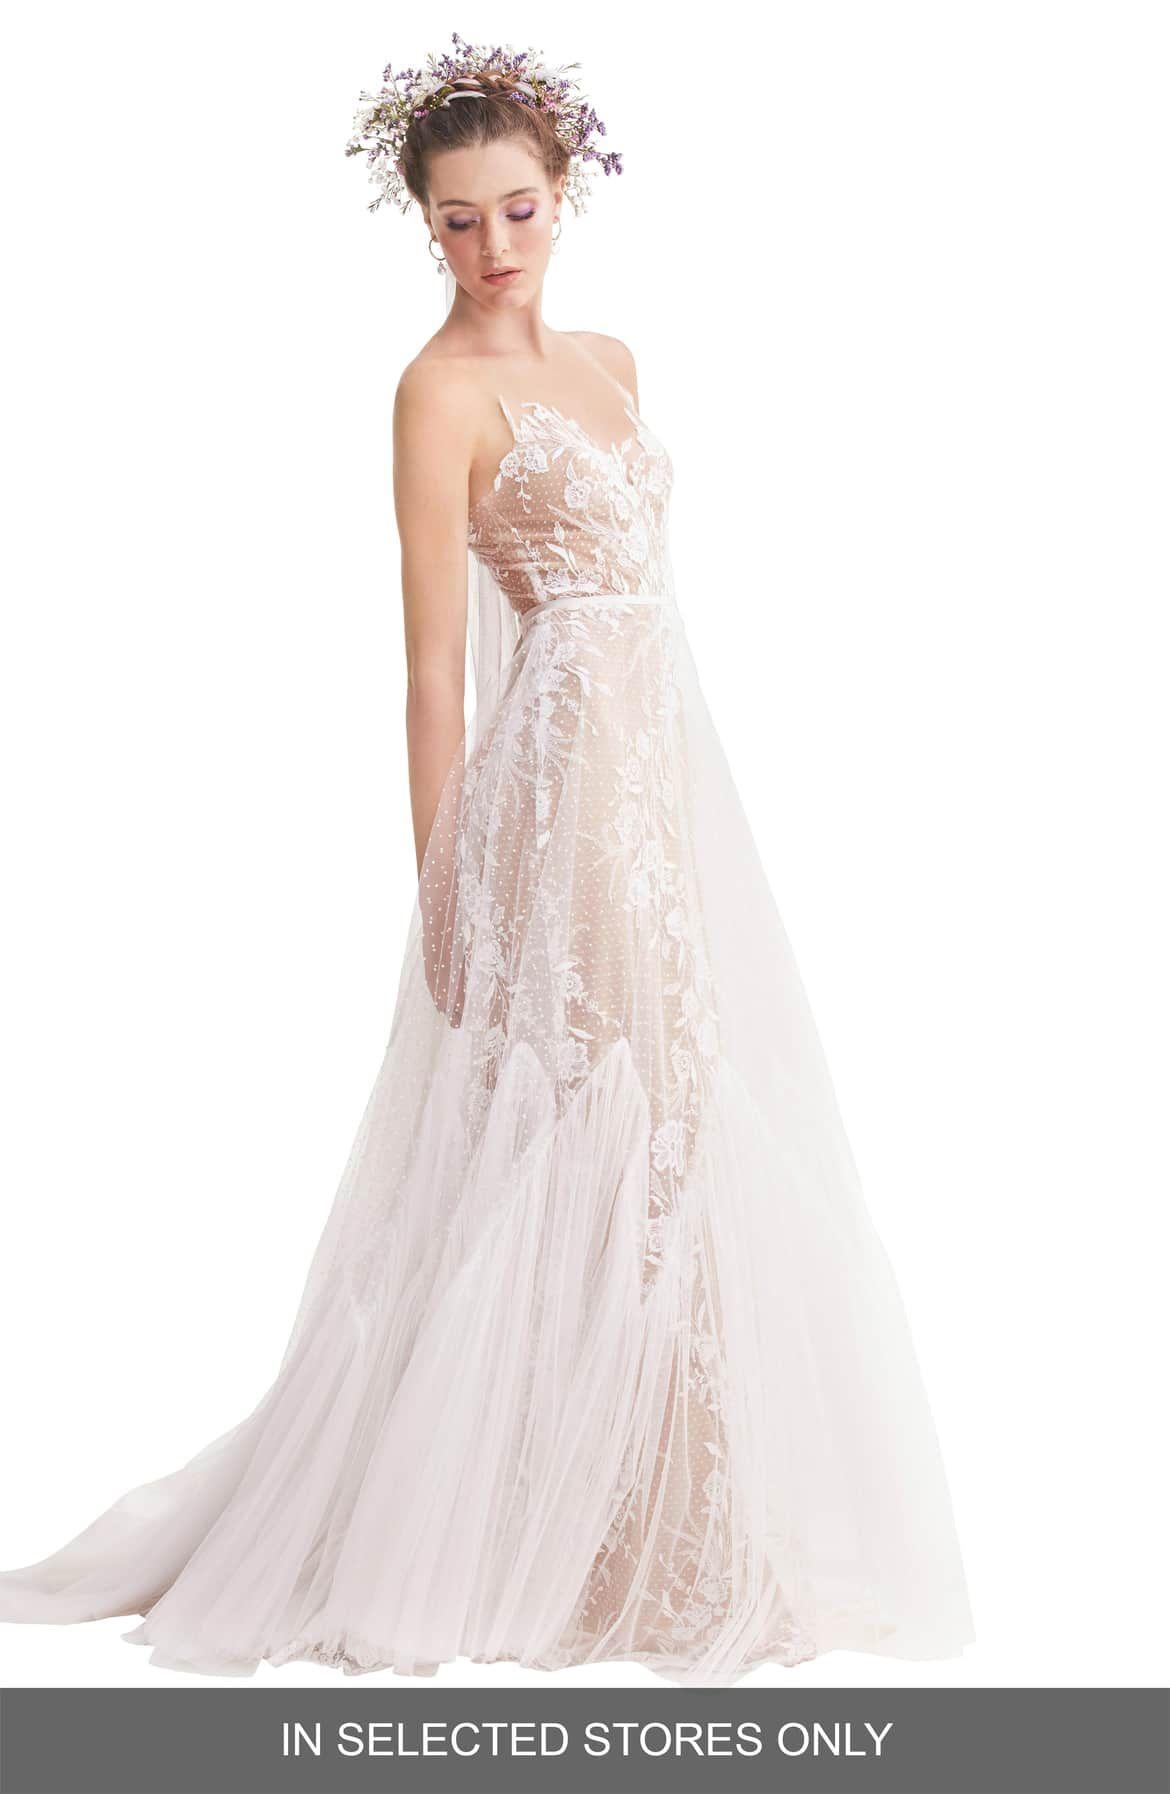 Willowby Capricorn Illusion Strapless A Line Wedding Dress Nordstrom Wedding Dress For Short Women Wedding Dresses For Girls A Line Wedding Dress